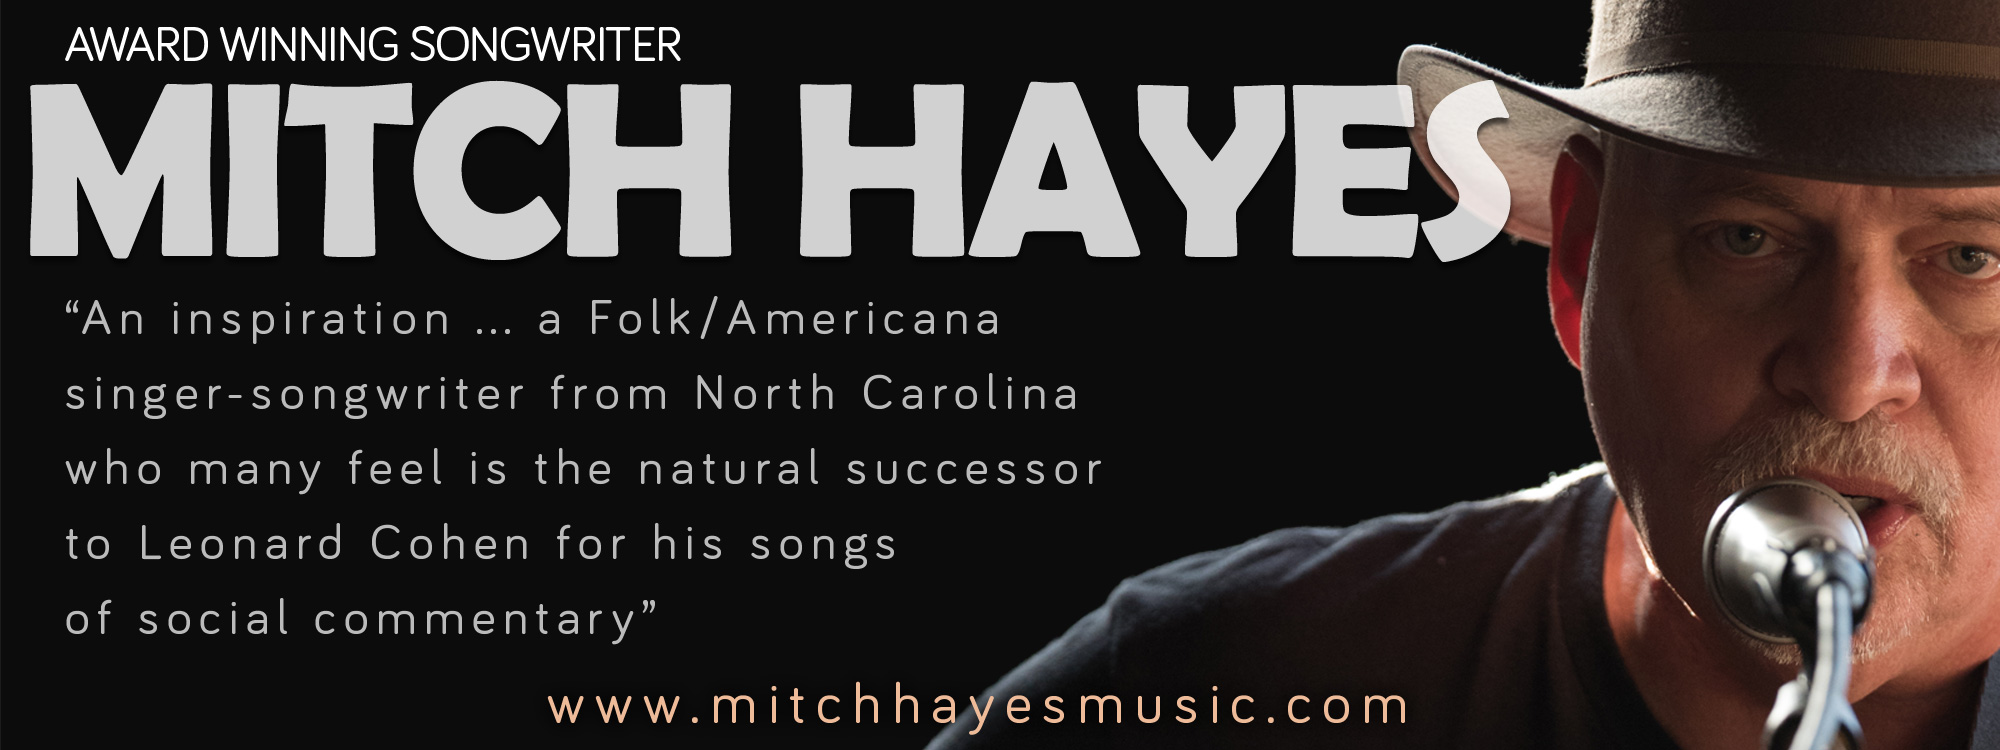 Mitch Hayes Music